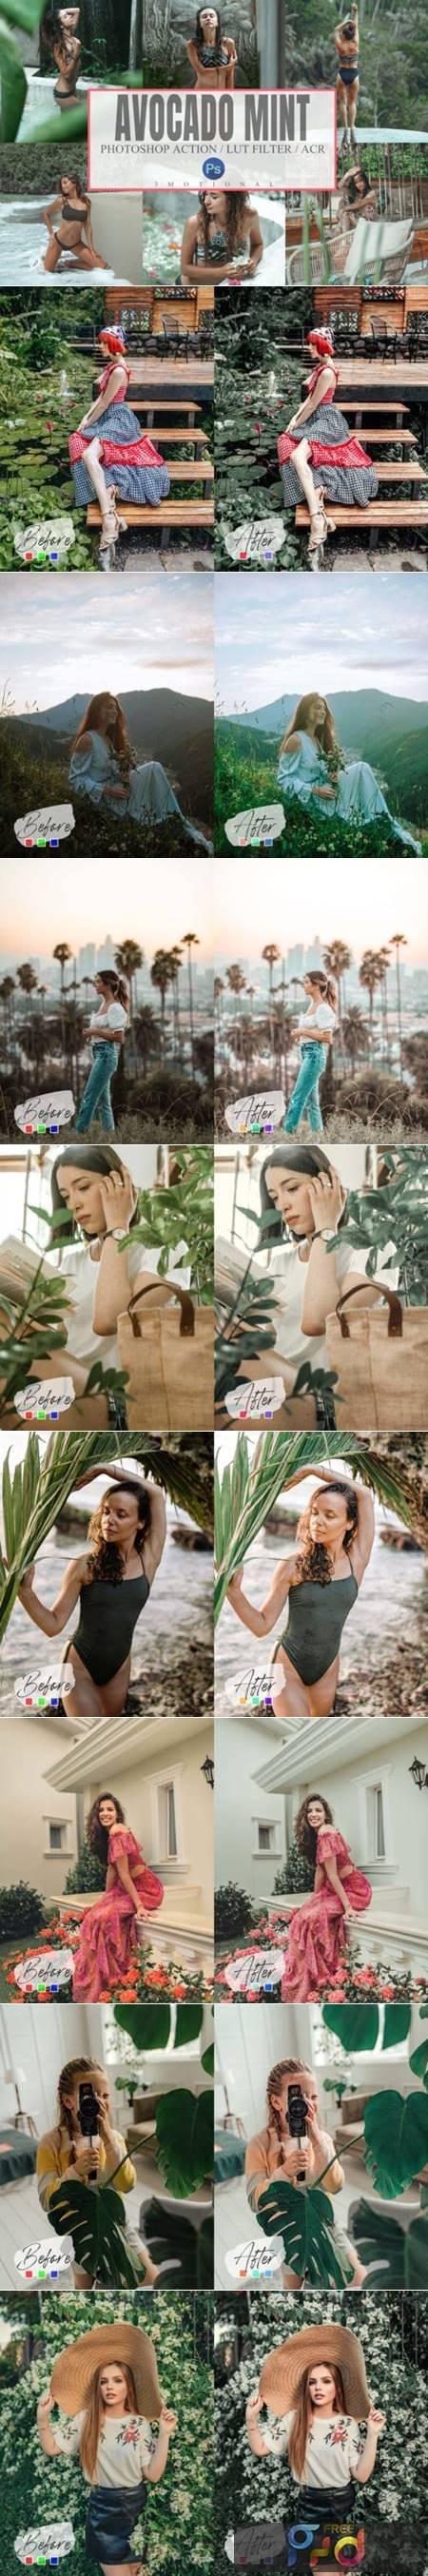 10 Avocado Mint Mood Photoshop Actions 6997450 1